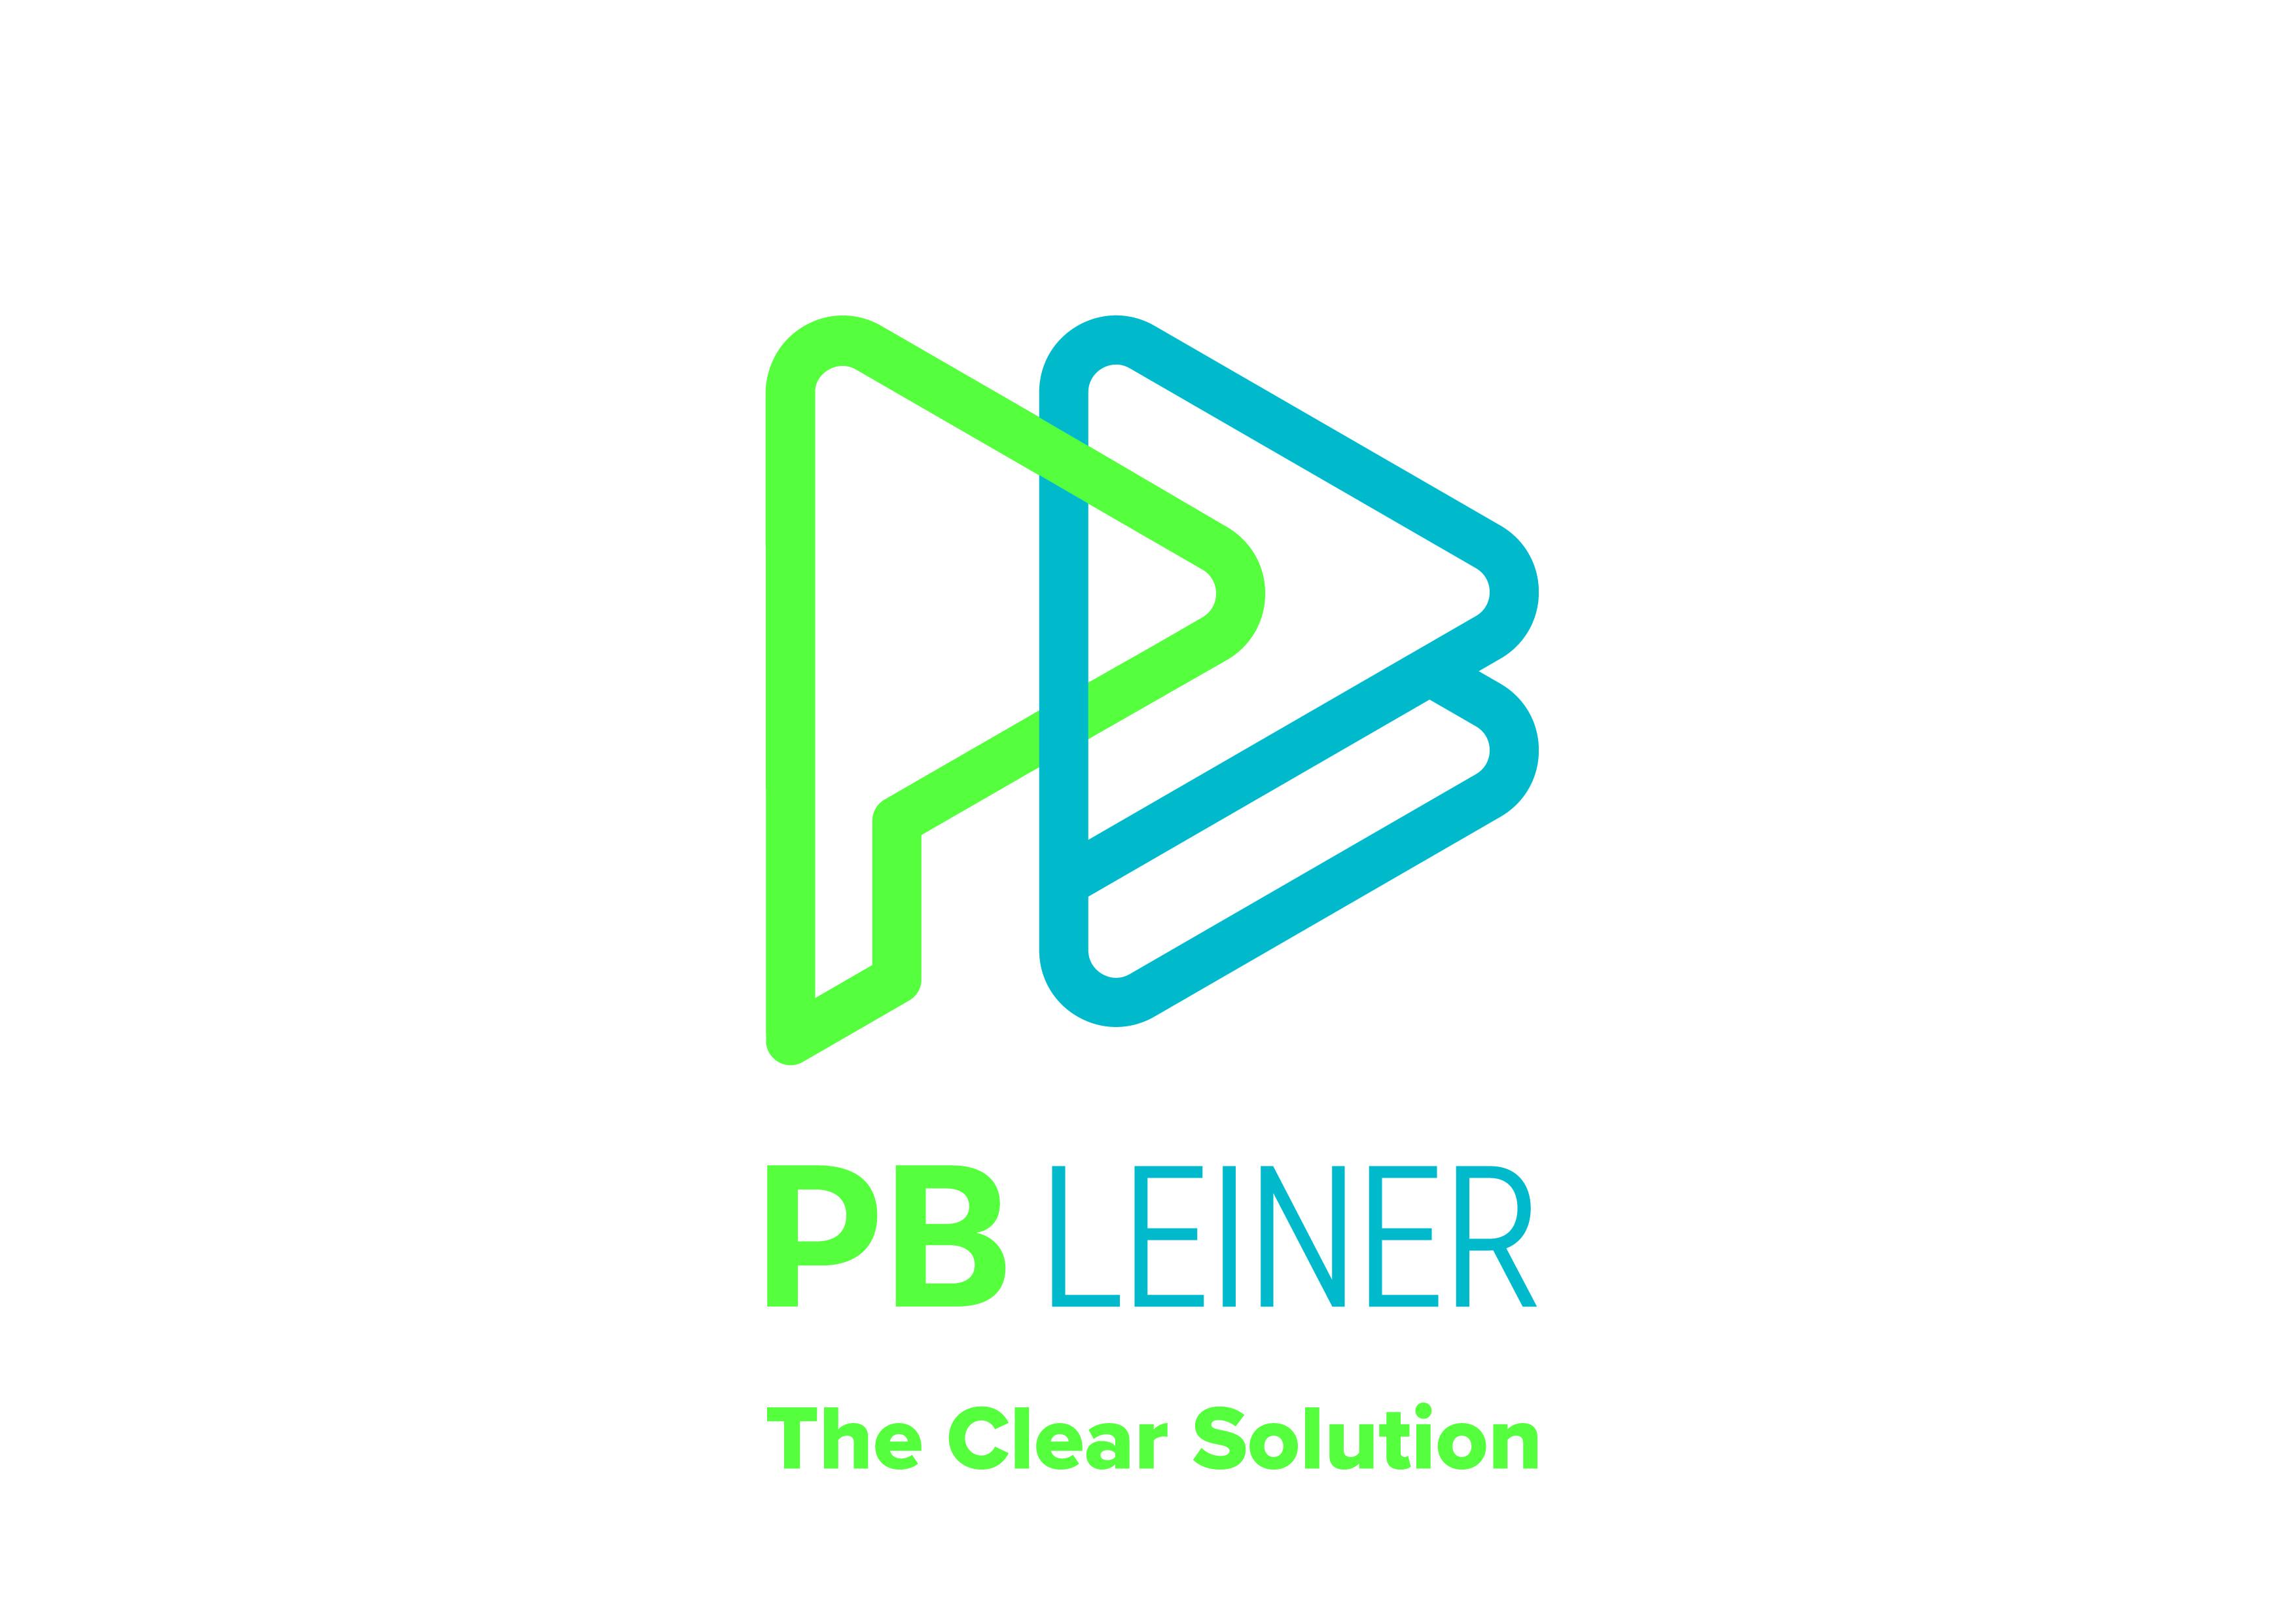 PB Gelatins/PB Leiner becomes PB Leiner